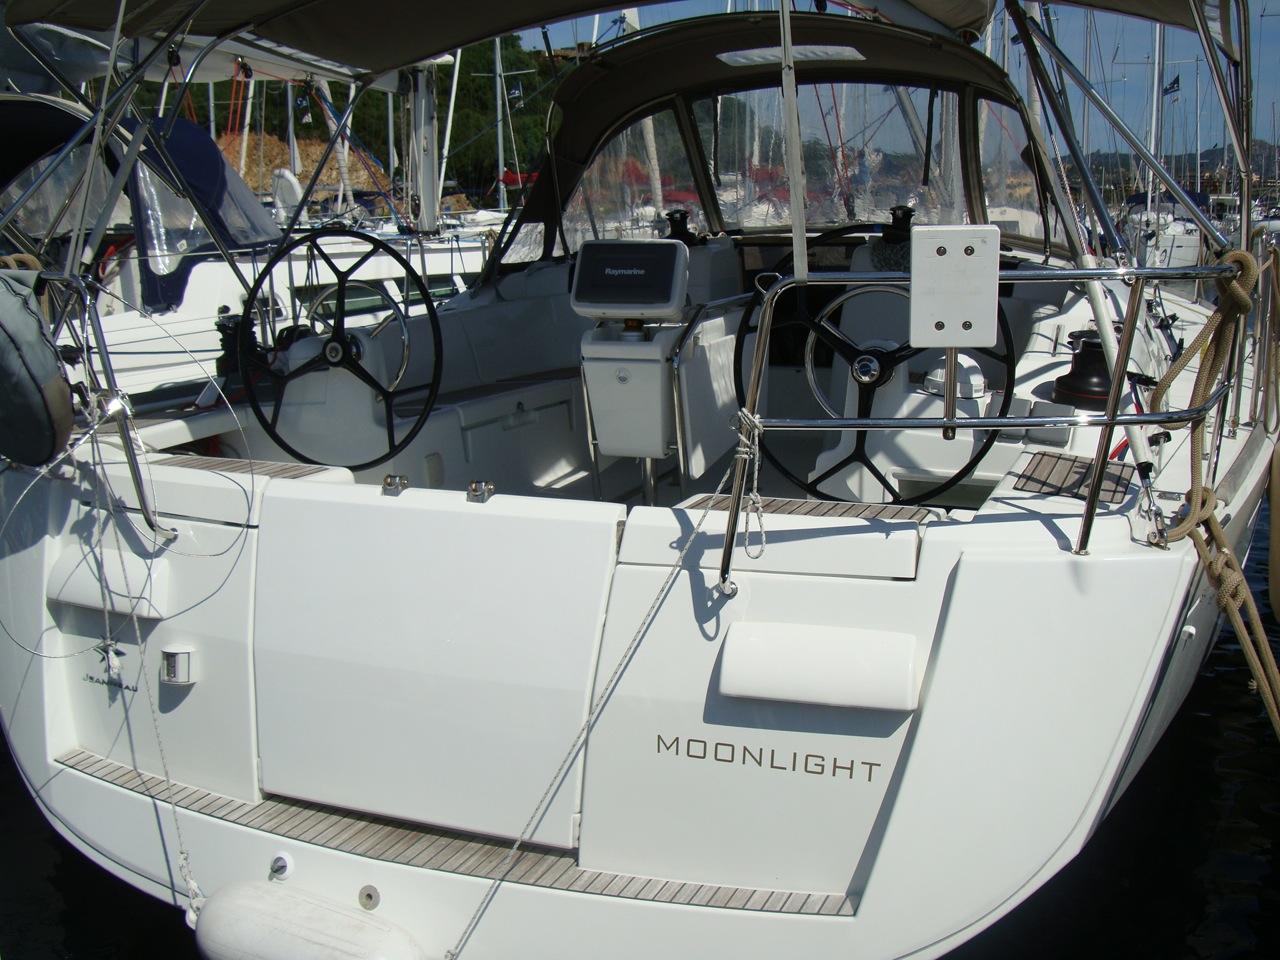 Sun Odyssey 439 Performance (Moonlight)  - 3